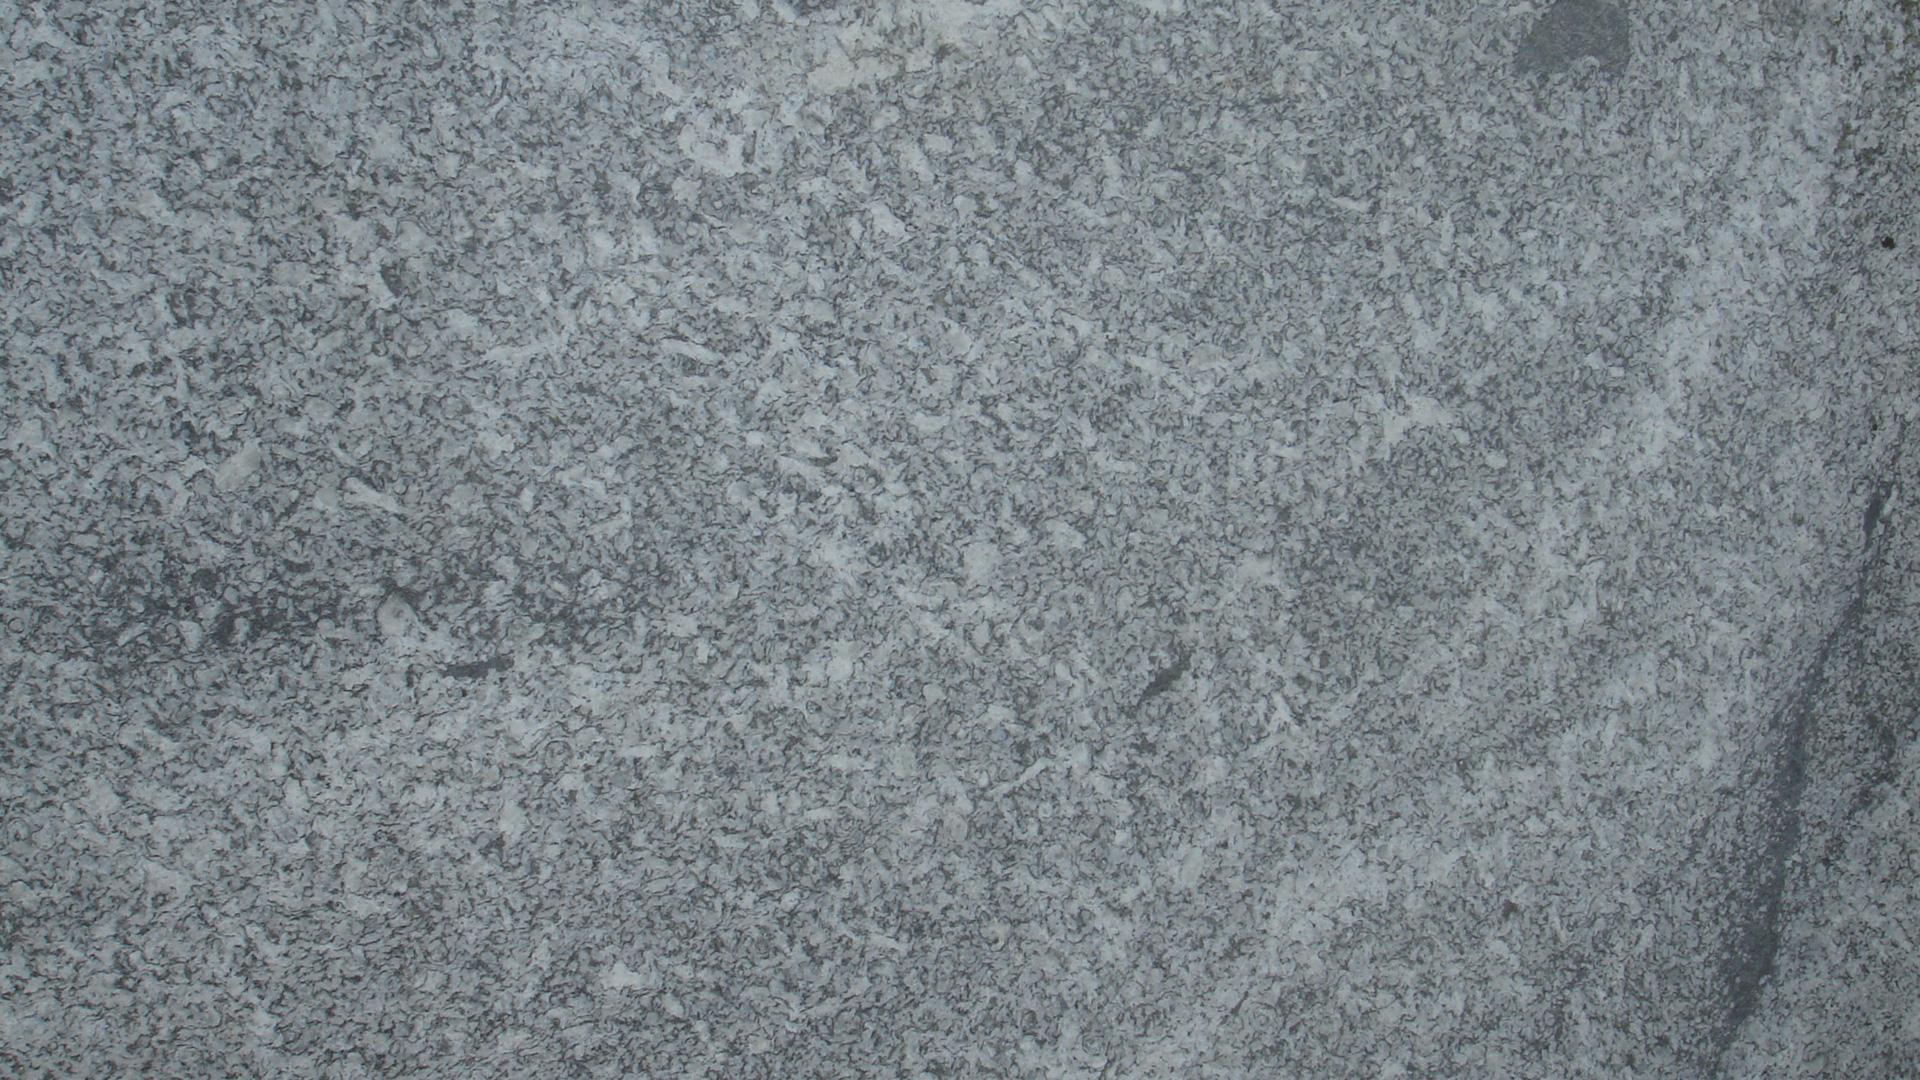 Naturstein silver real wagner treppenbau mainleus - Naturstein textur ...